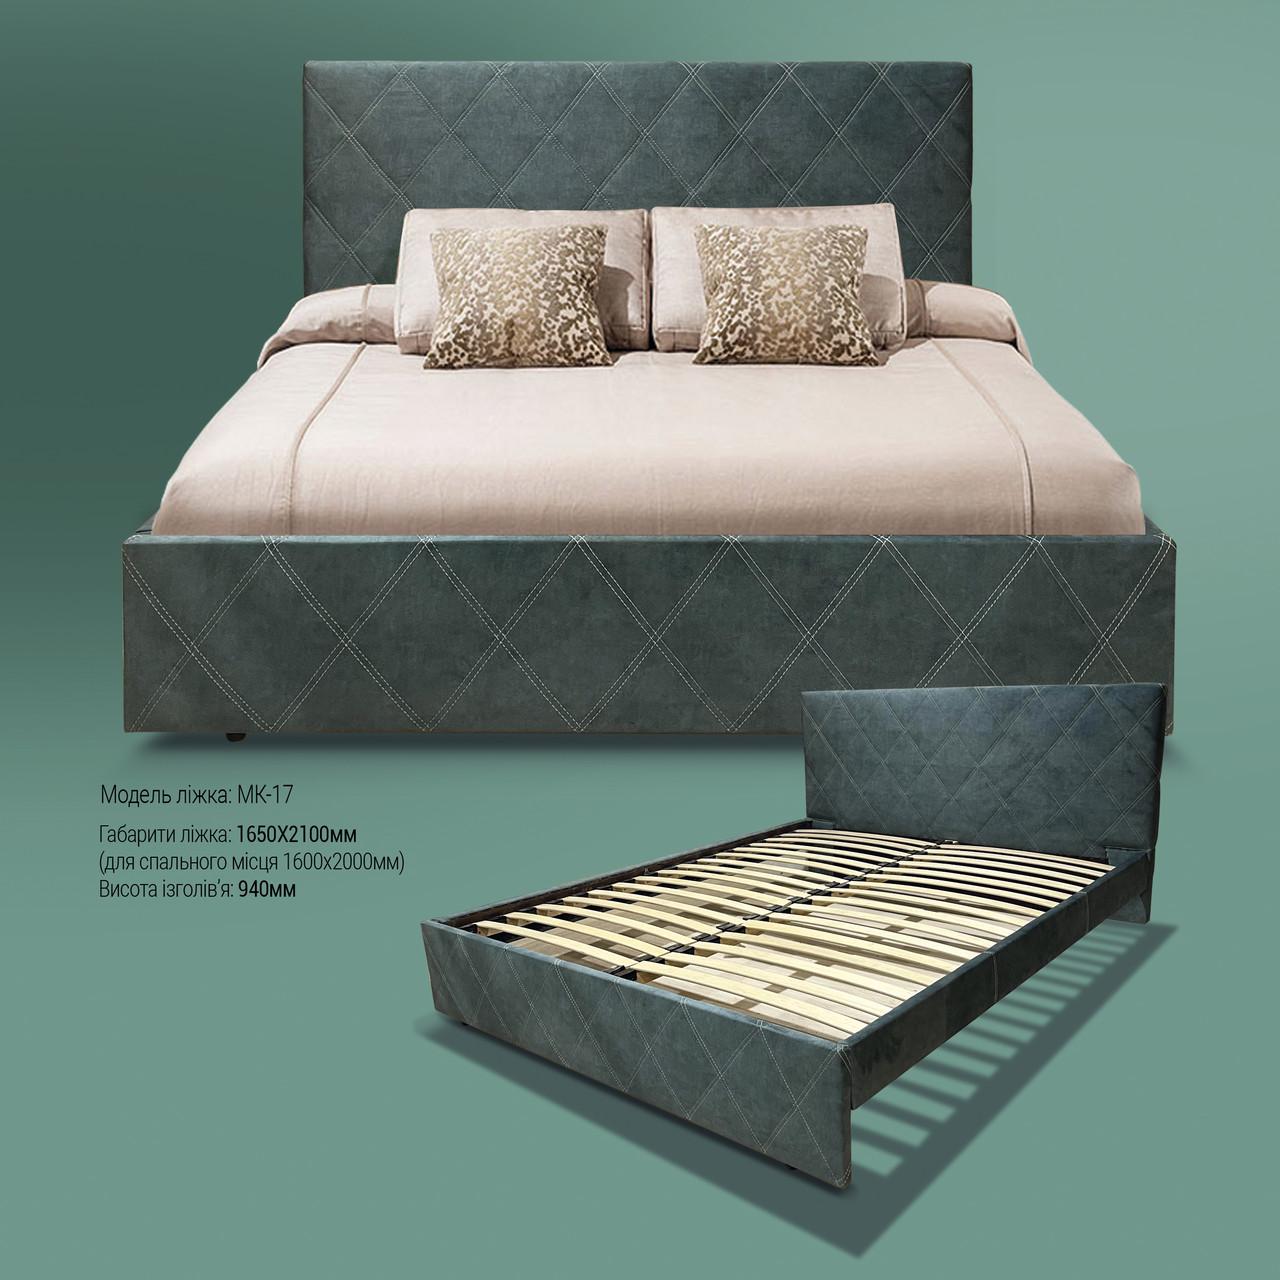 М'яке ліжко МК-17 MegaMebli